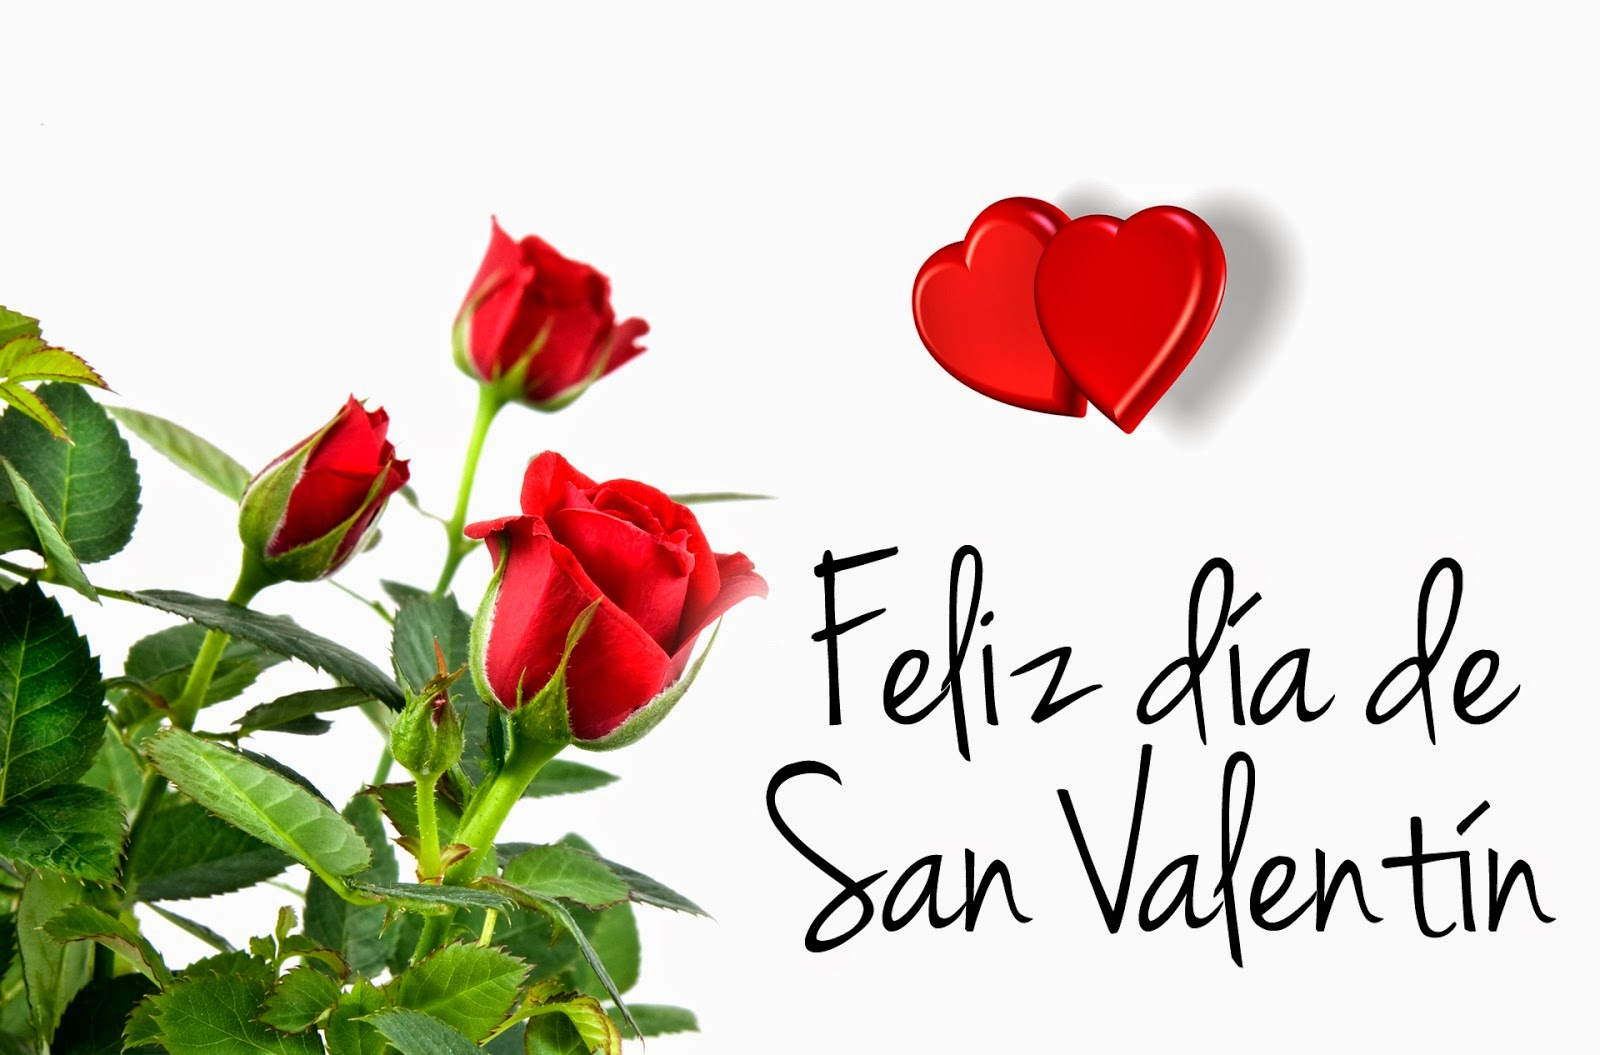 Frases De San Valentín: Feliz Día De San Valentín